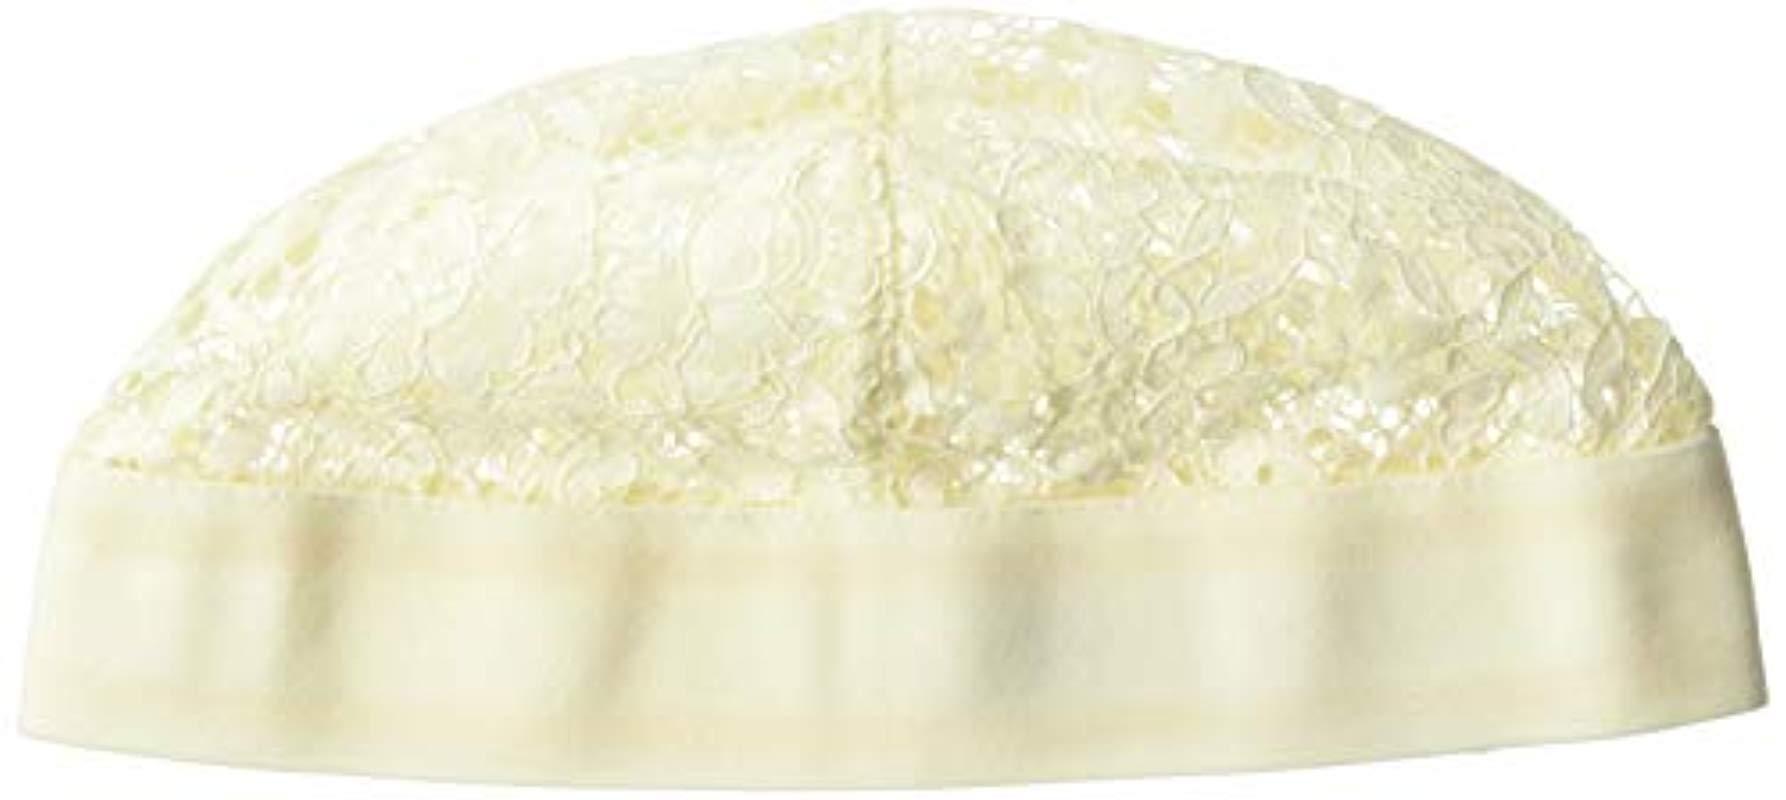 8d4afdd78f4 Lyst - PUMA Fenty Lace Skull Cap in Yellow